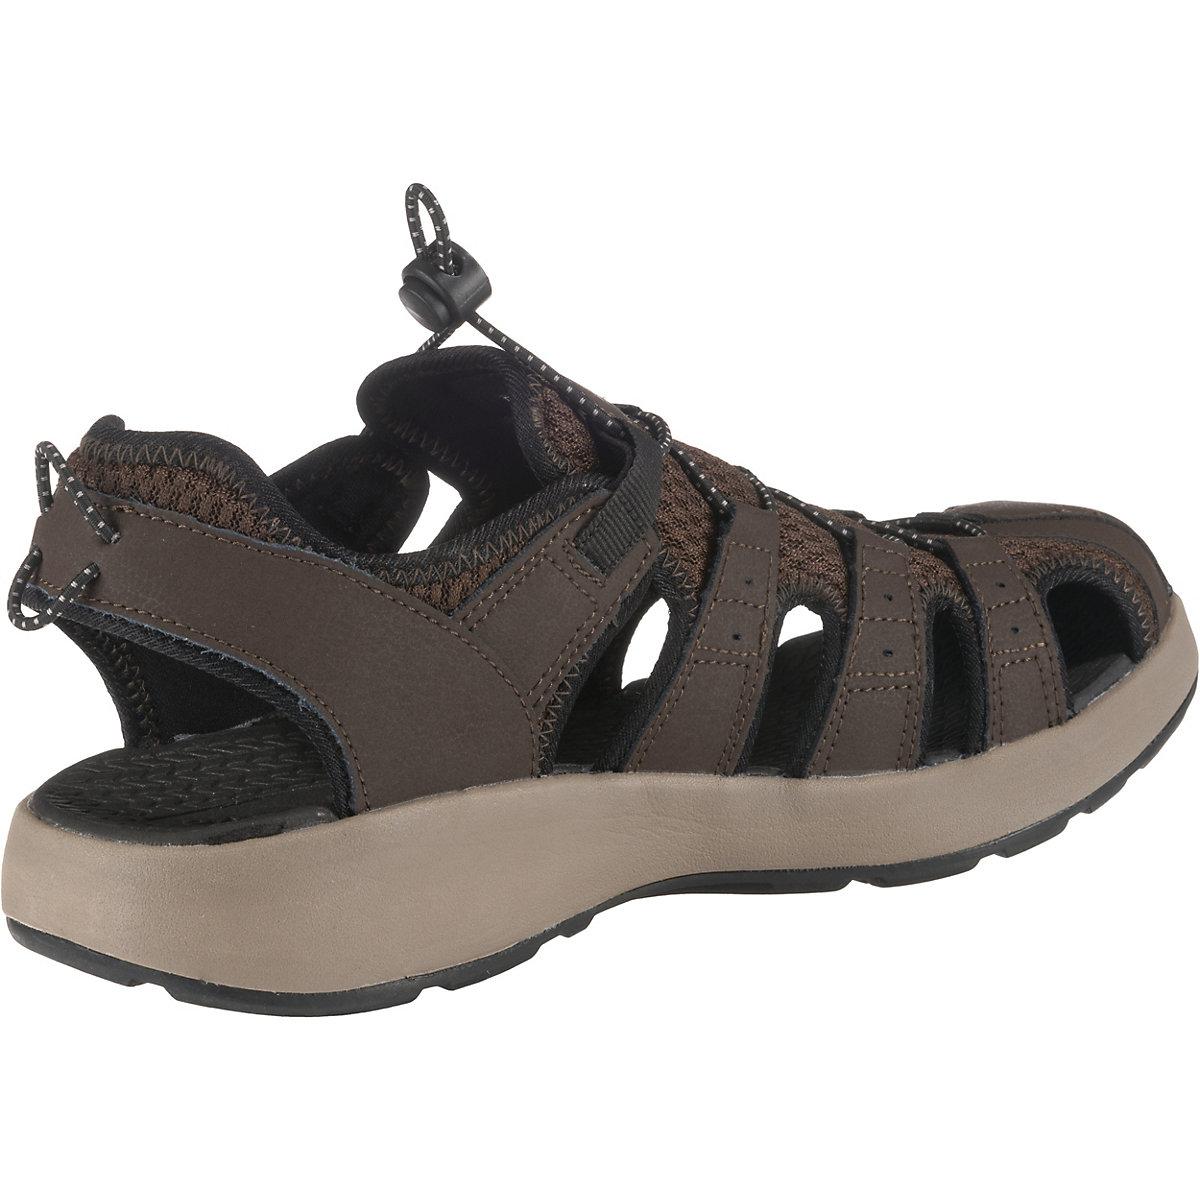 Skechers, Melbo - Journeyman 2 Outdoorsandalen, Braun